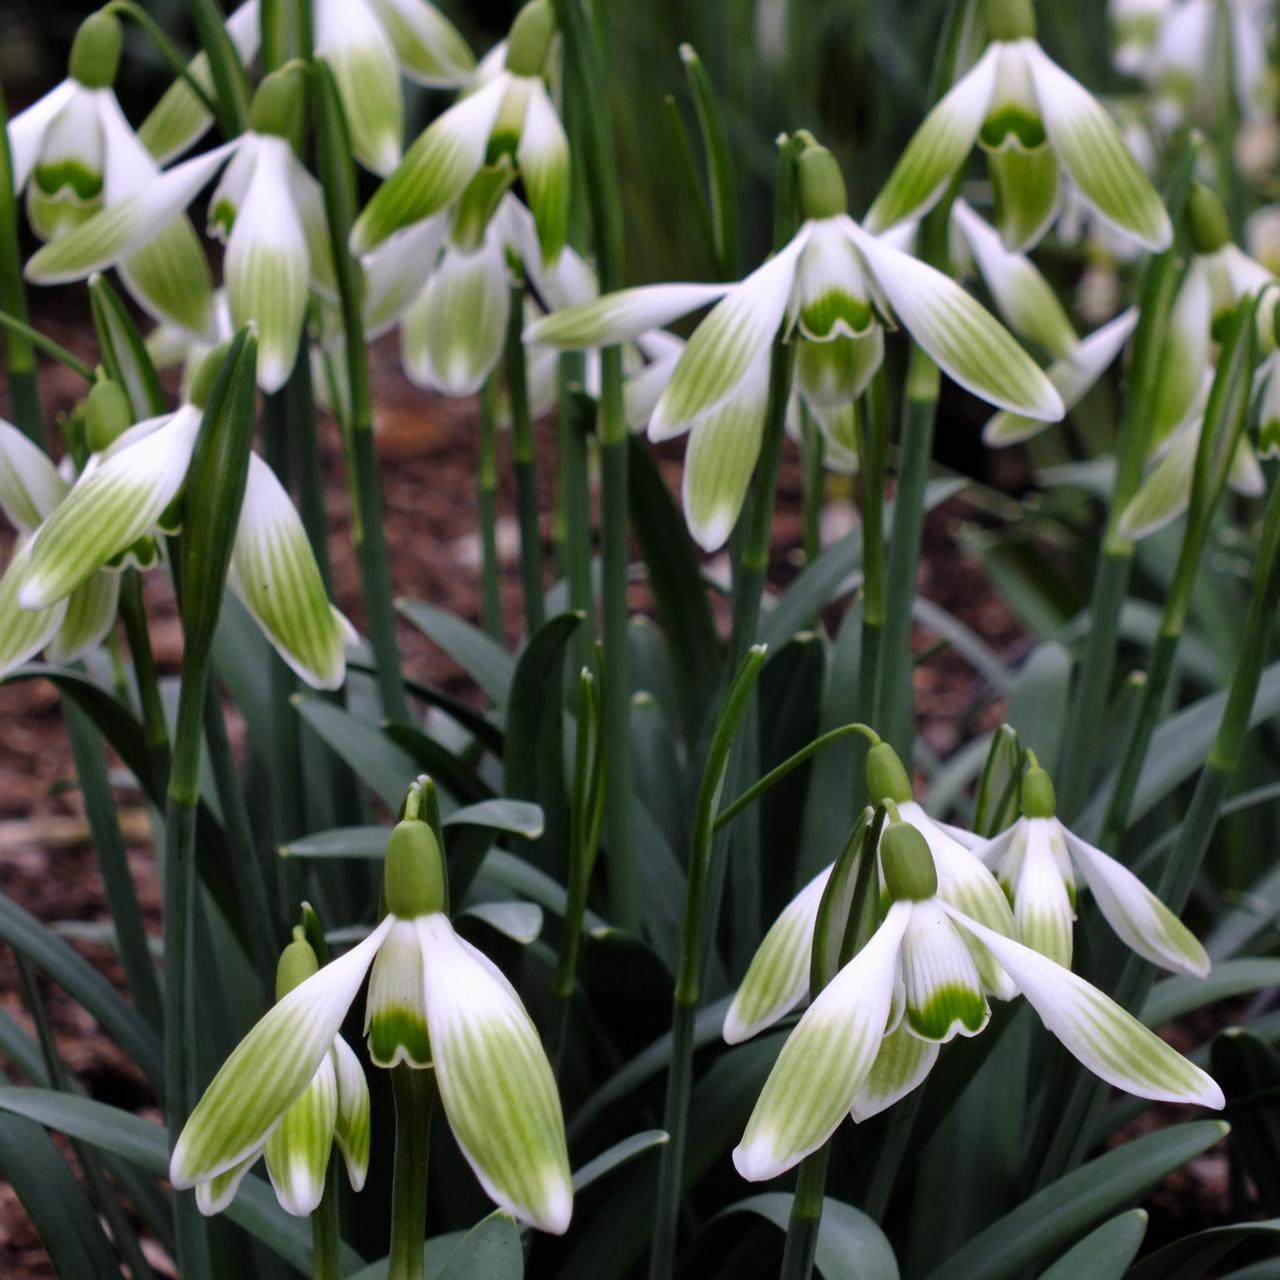 Galanthus nivalis 'Hugh Mackenzie' plant